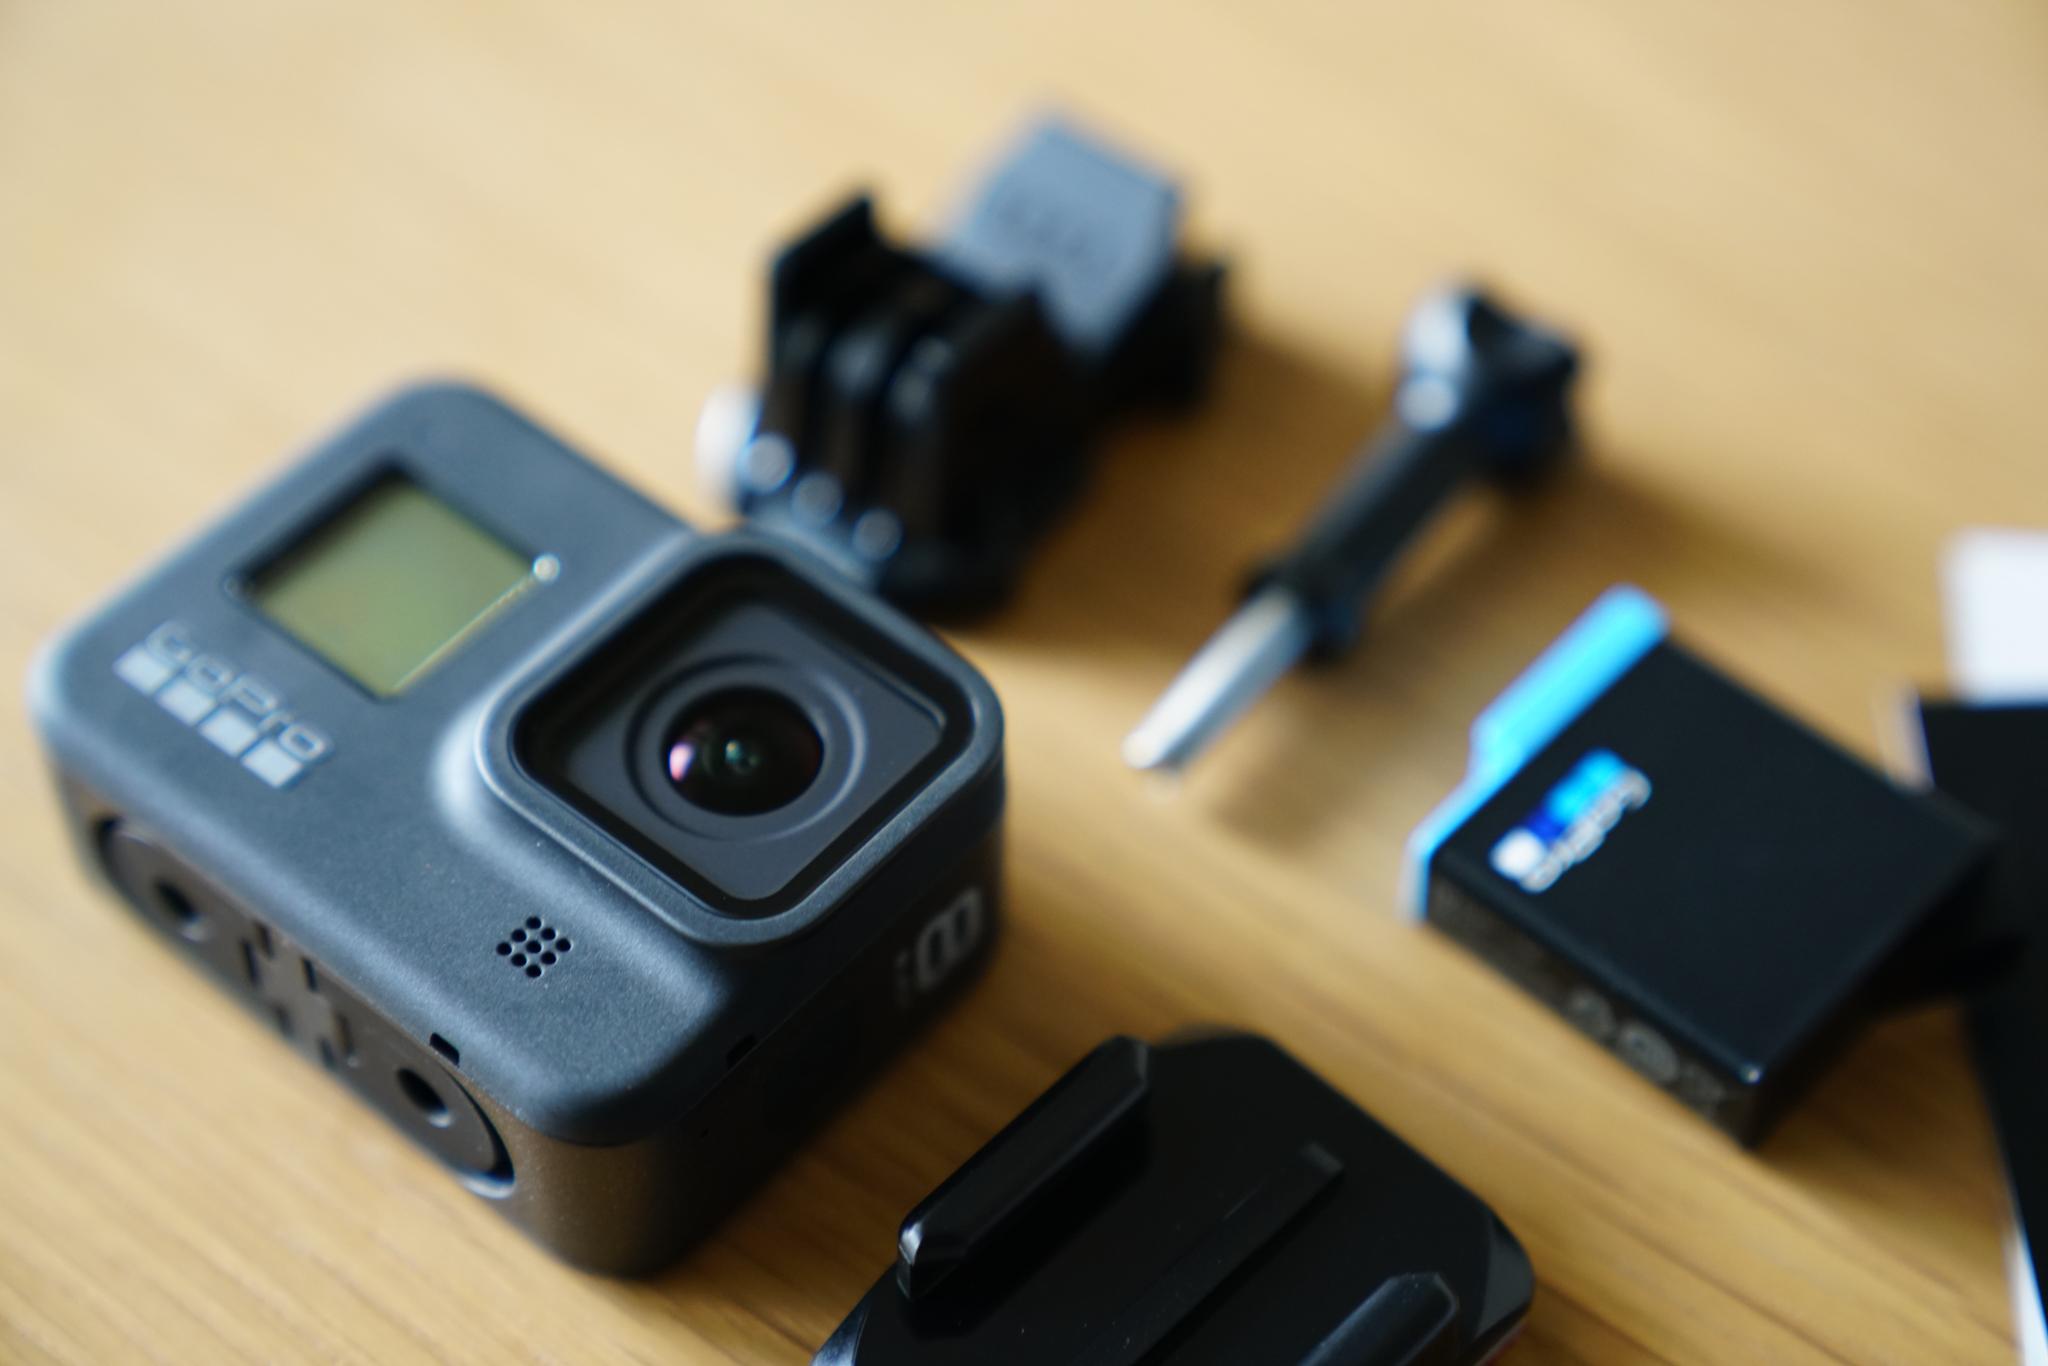 GoProのバッテリー持ちを良くする!!5テク&オススメバッテリーアイテム4選